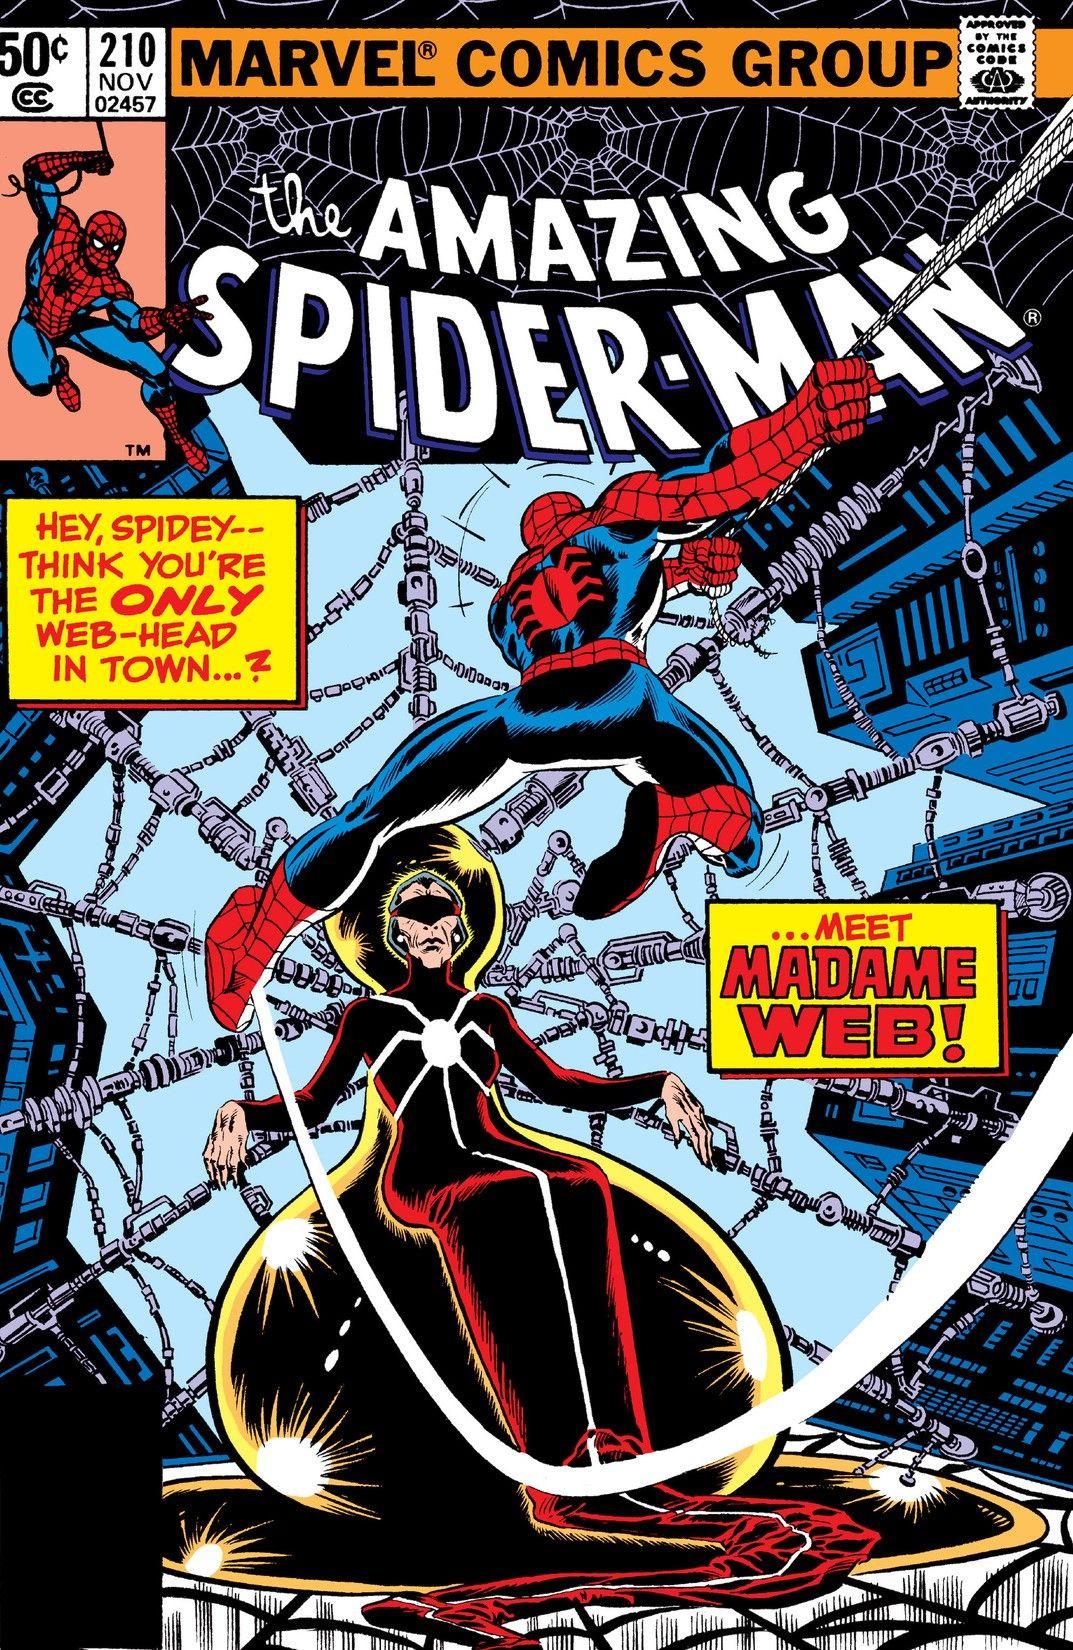 Image result for Madame Web comics spiderman  210